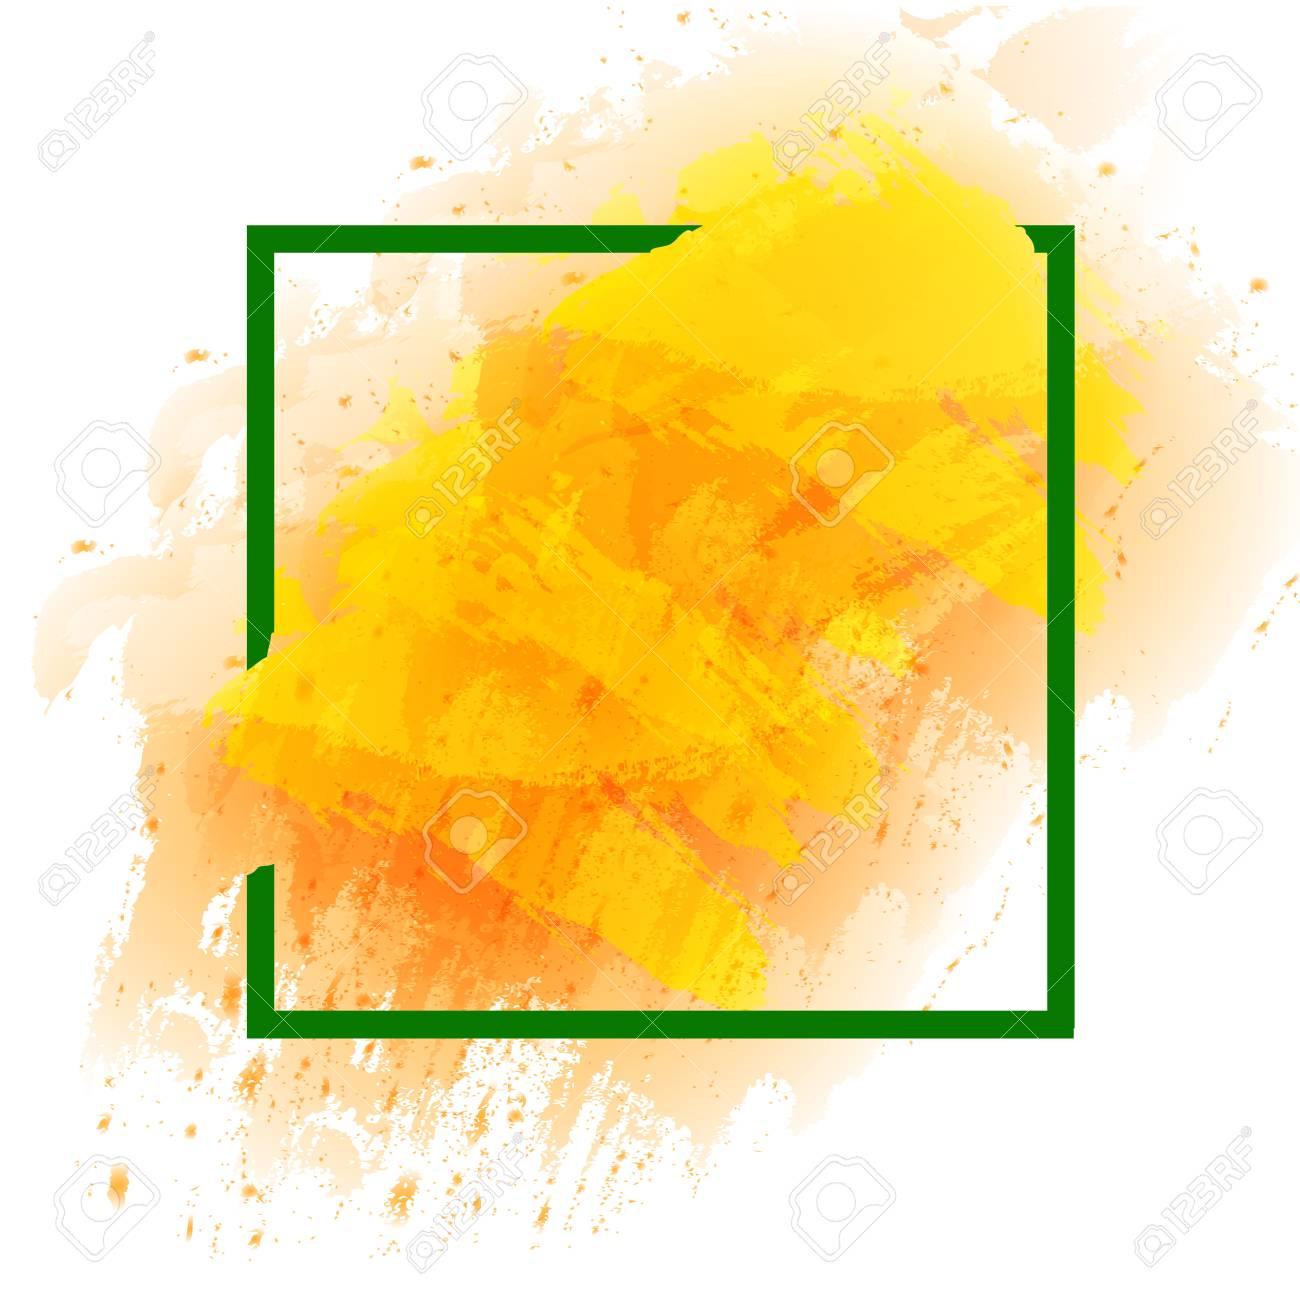 summer spring season colors frame modern border blank template